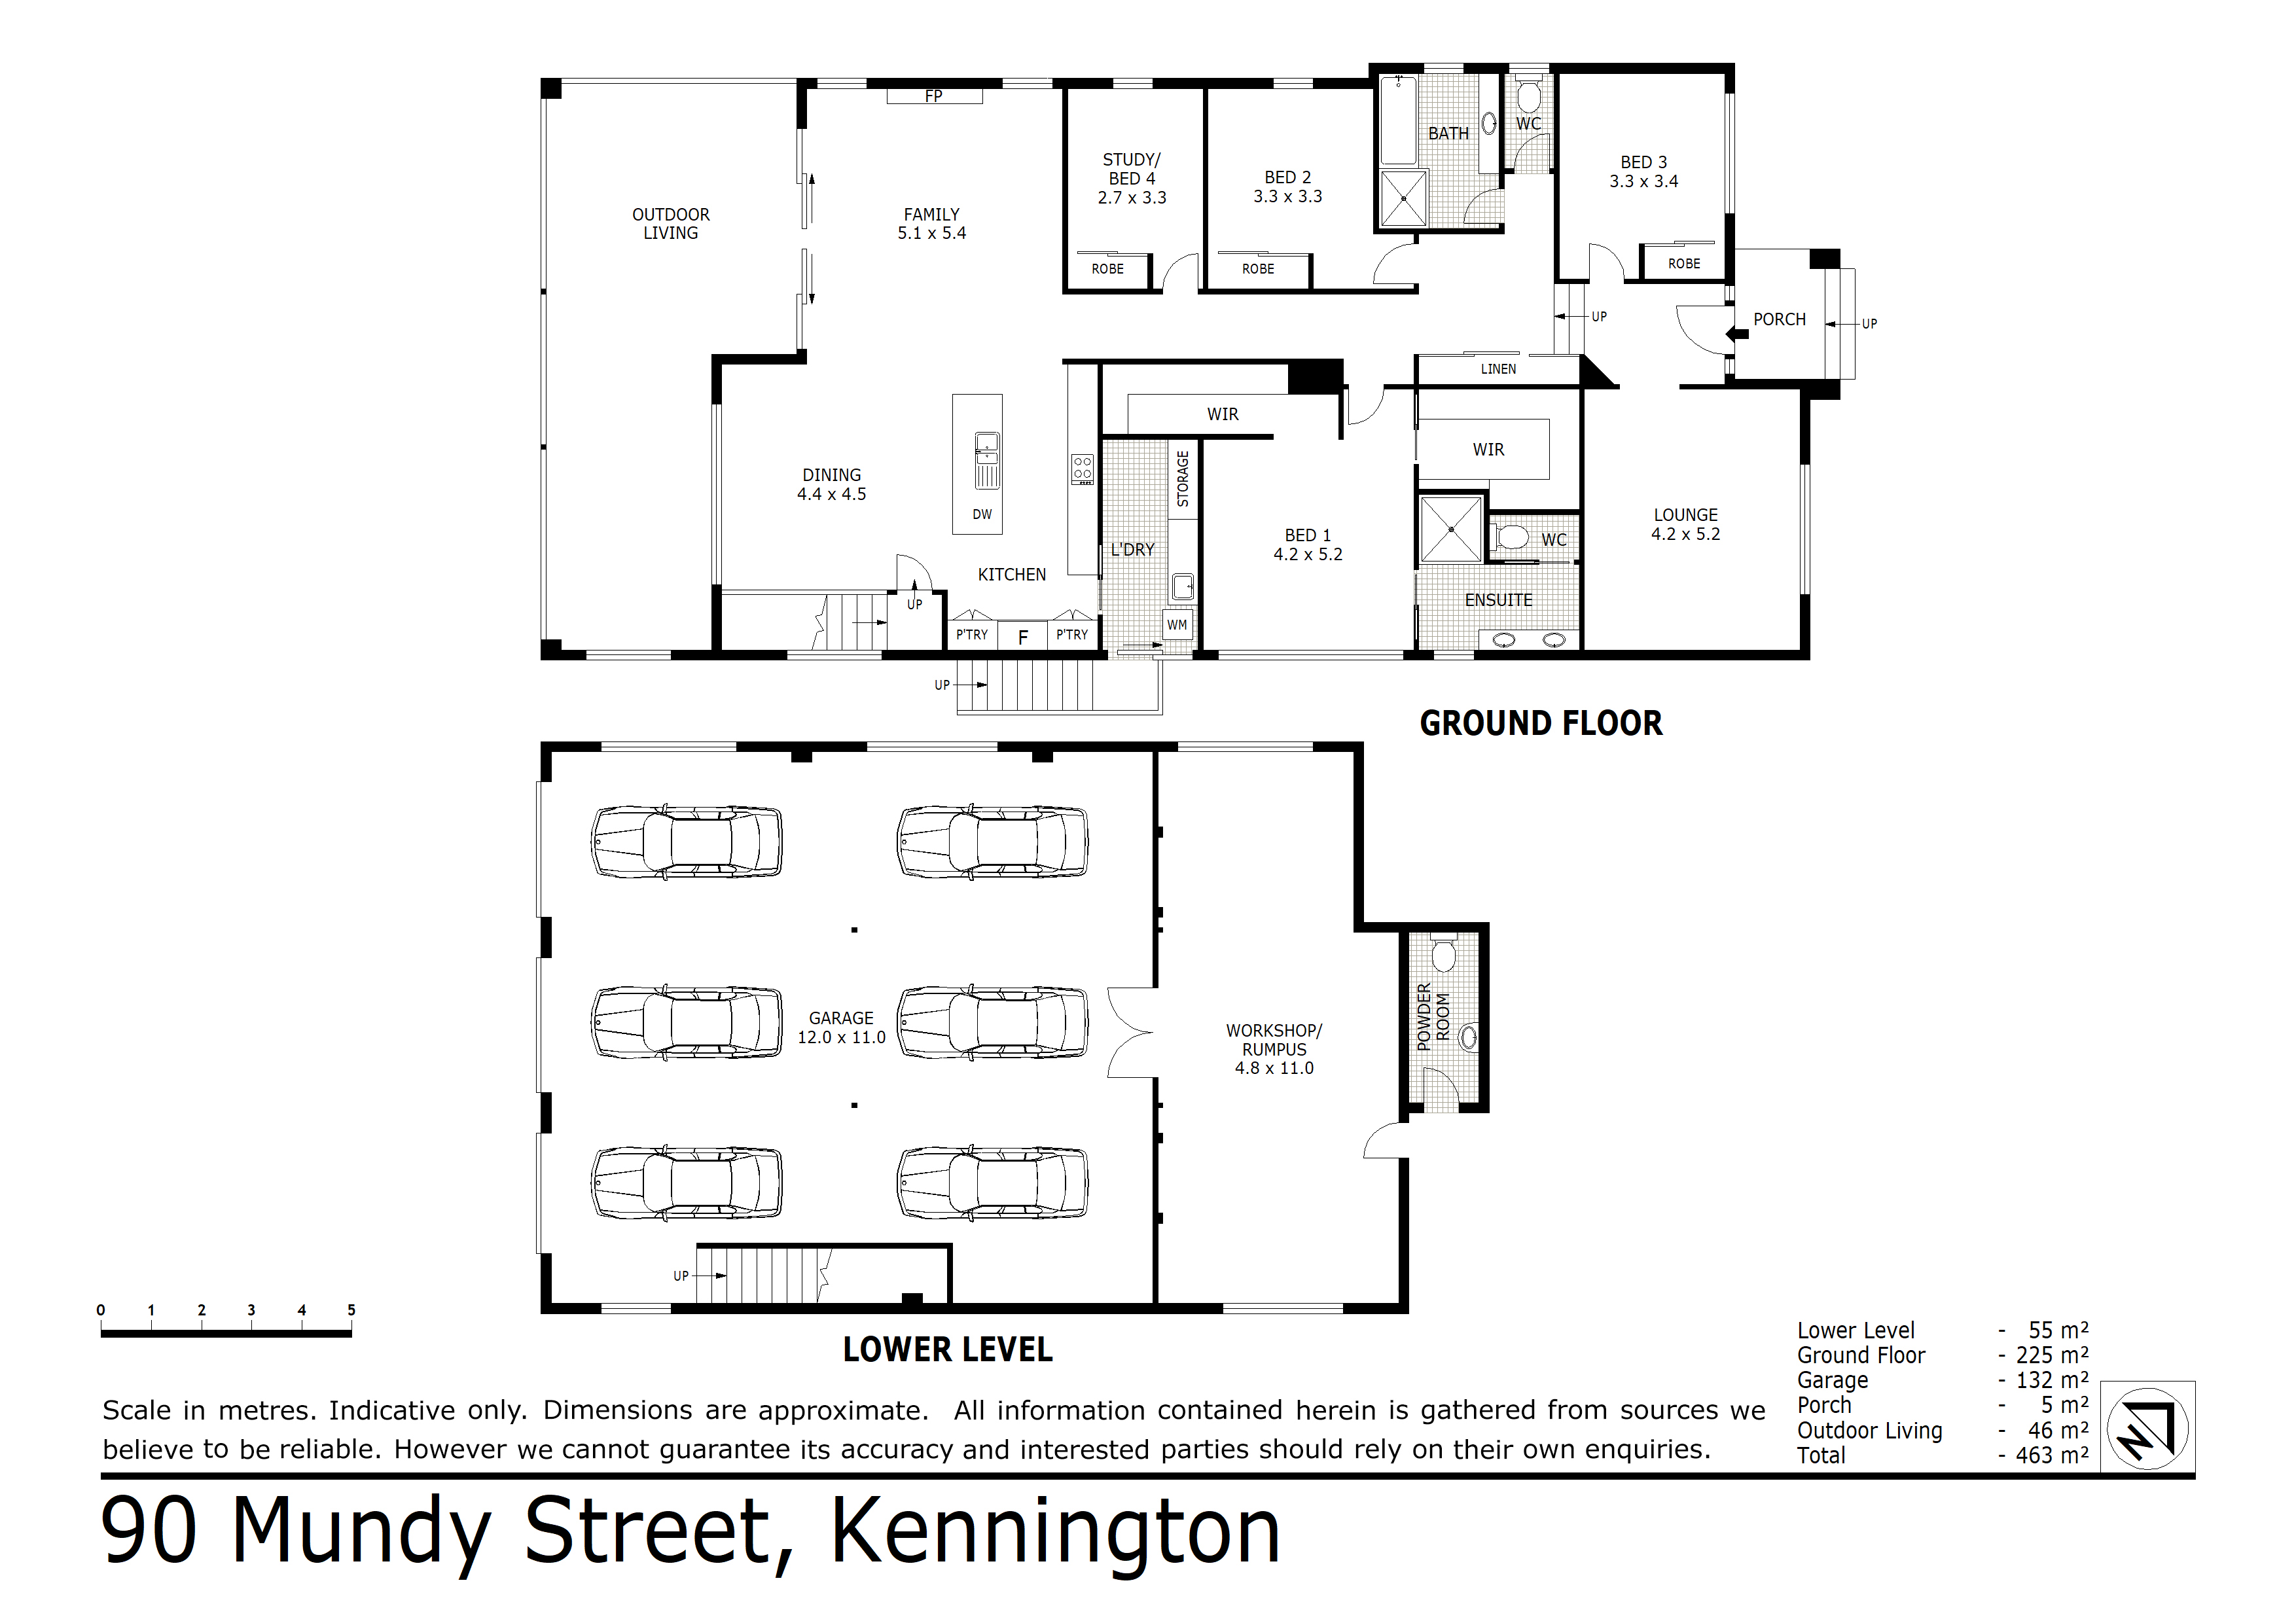 90 Mundy Street, Kennington, VIC 3550